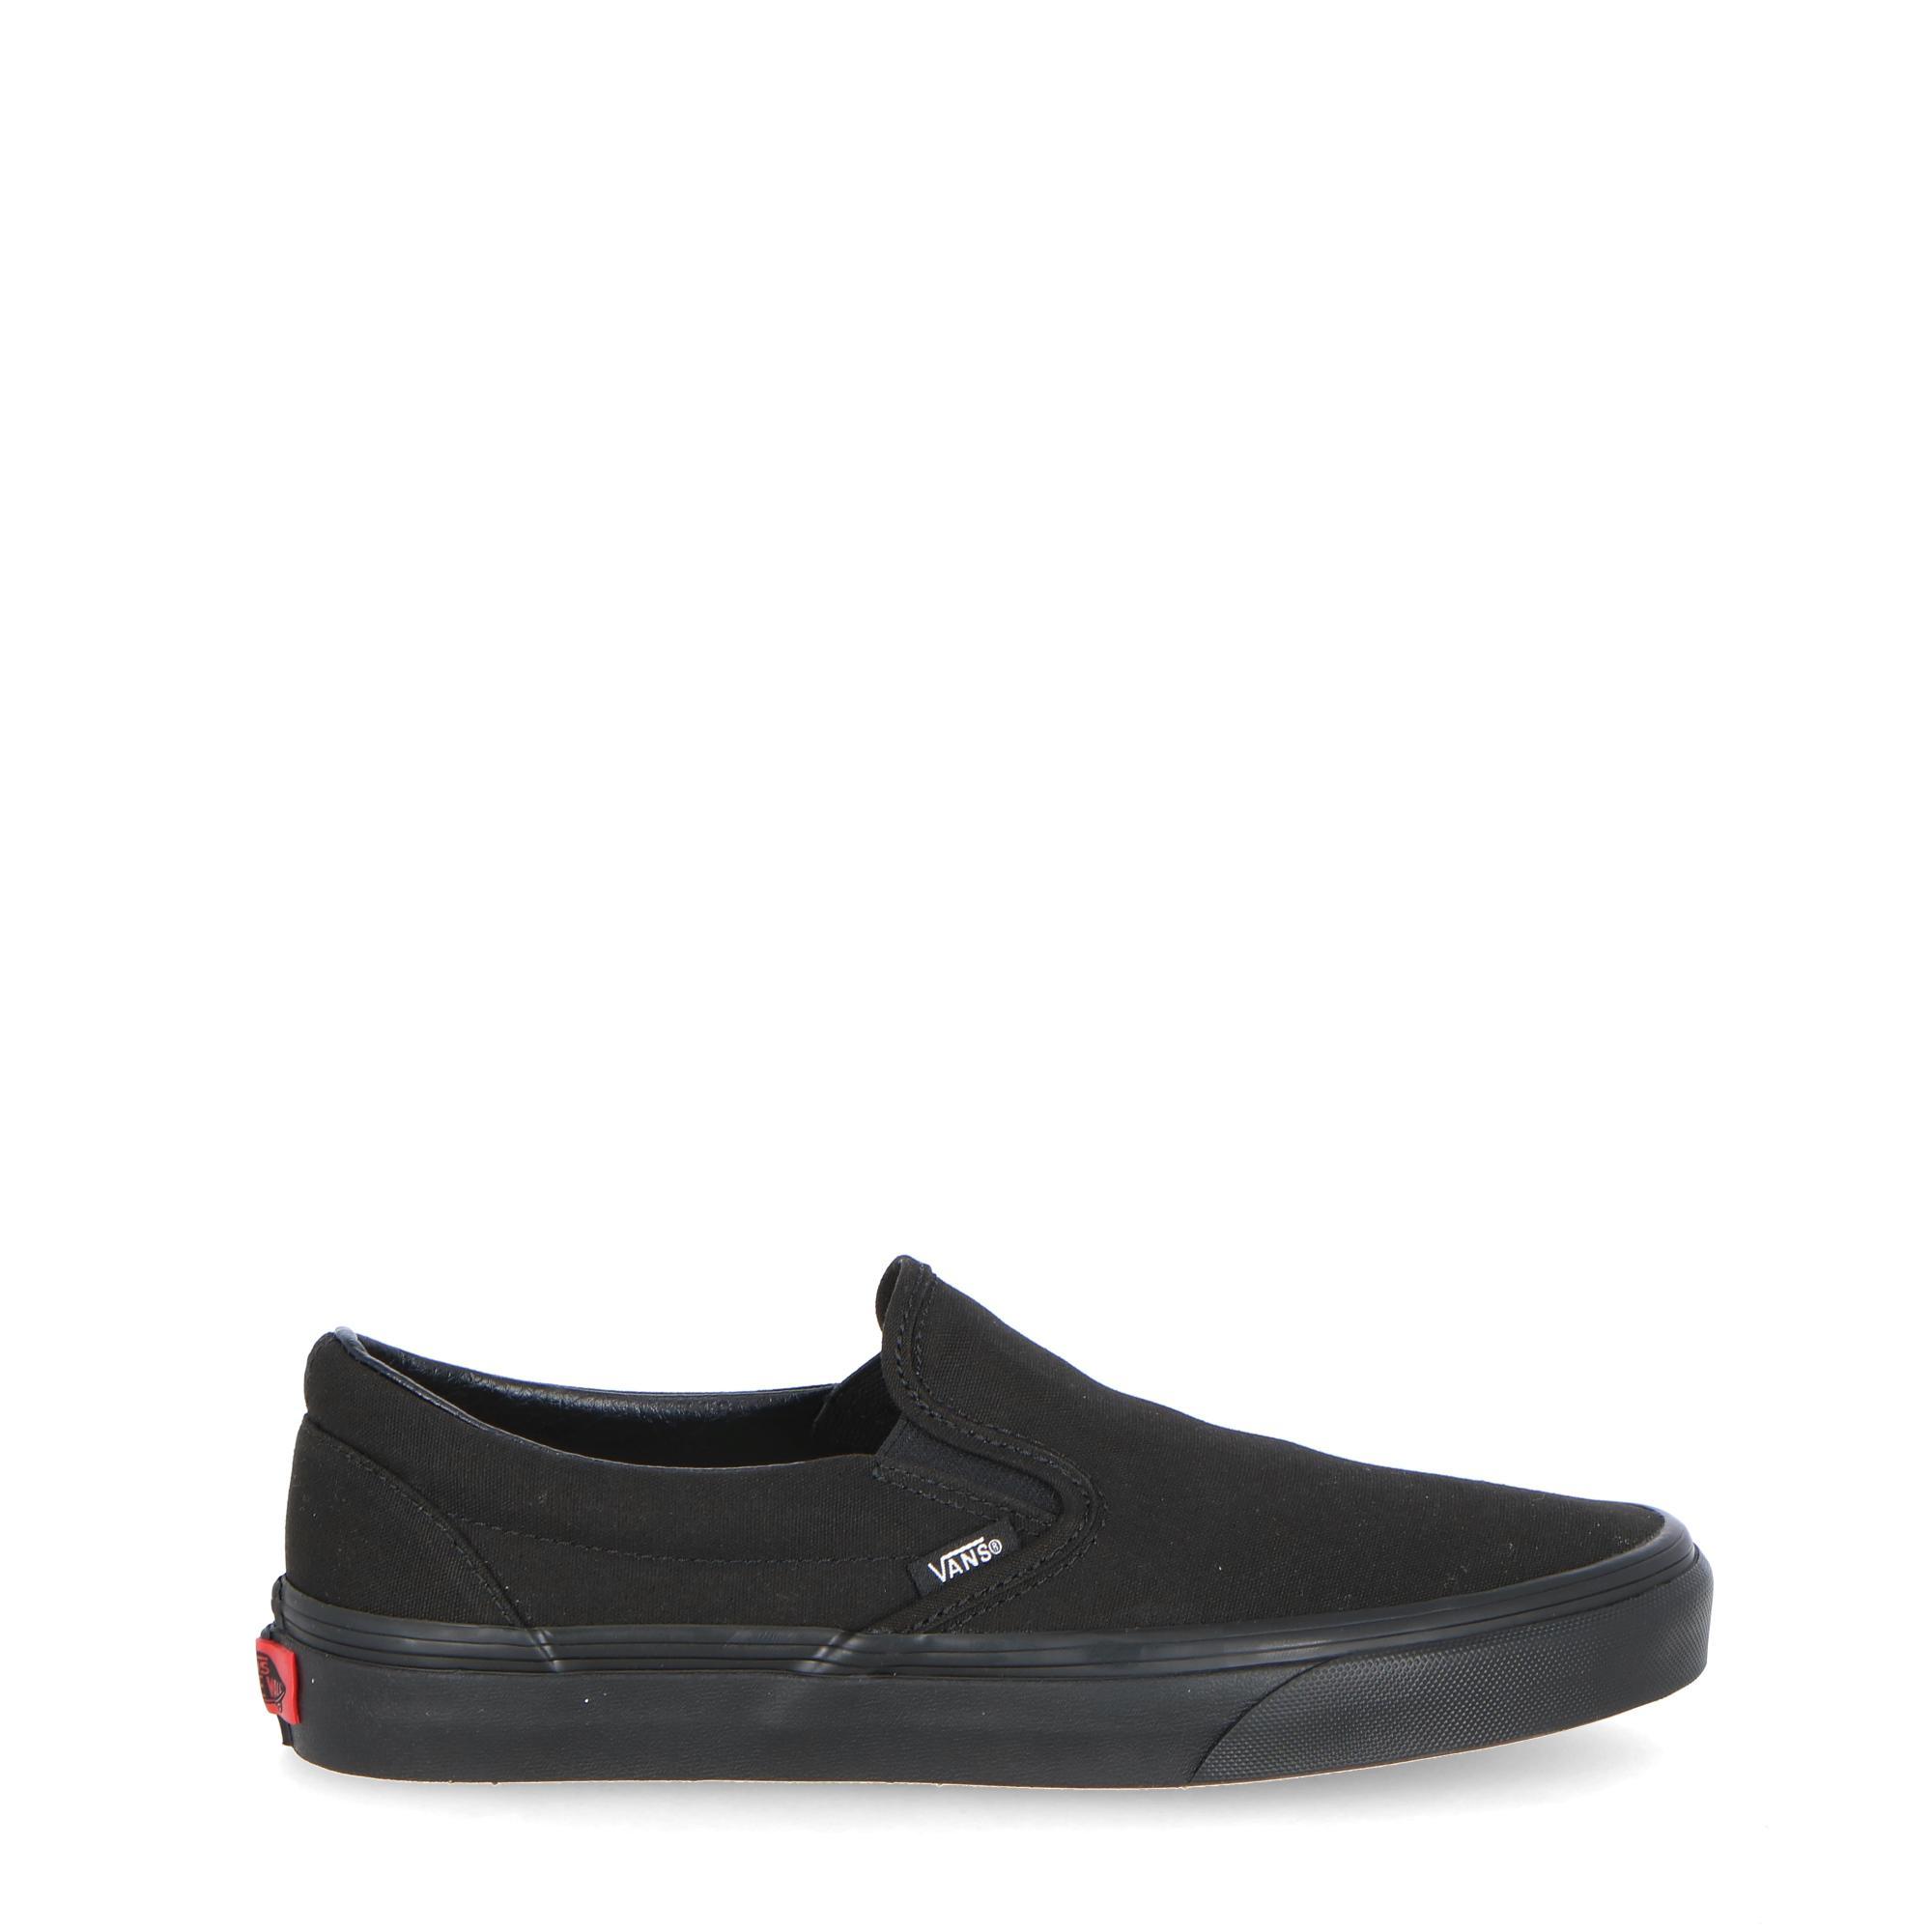 Vans Ua Classic Slip-on Black black